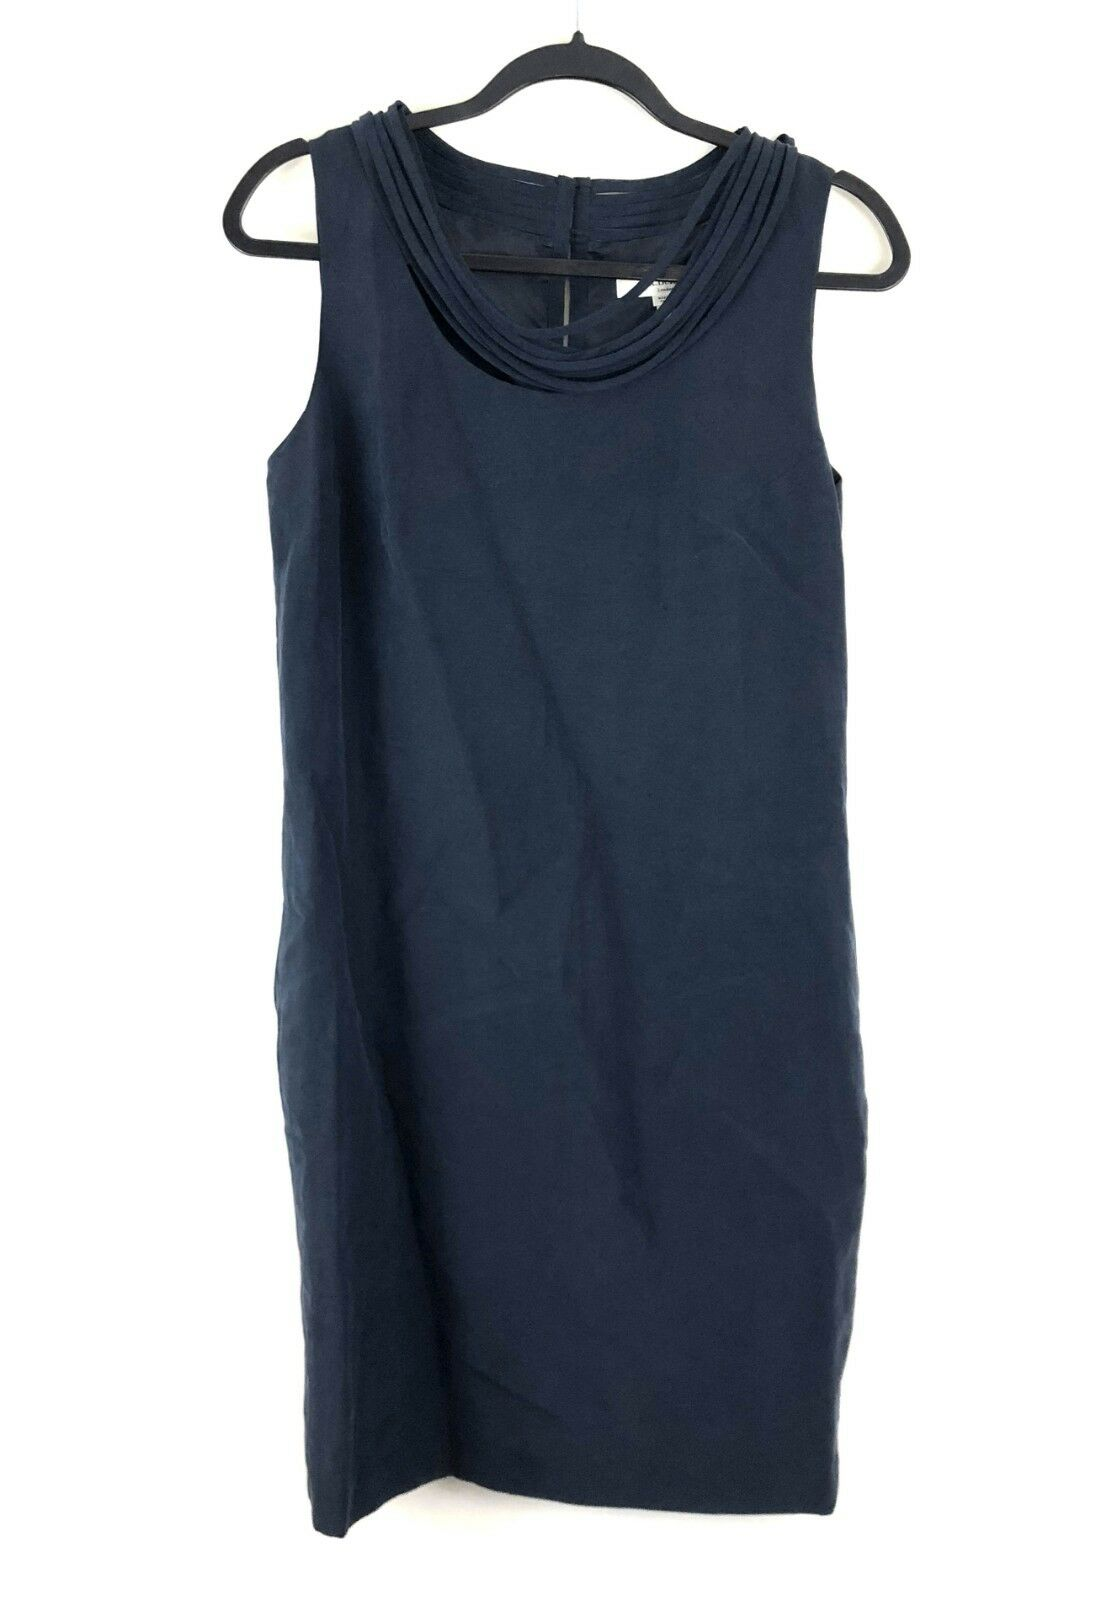 L.K. Bennett Della Shift Dress US 8 Silk & Linen Blend Navy bluee New  425